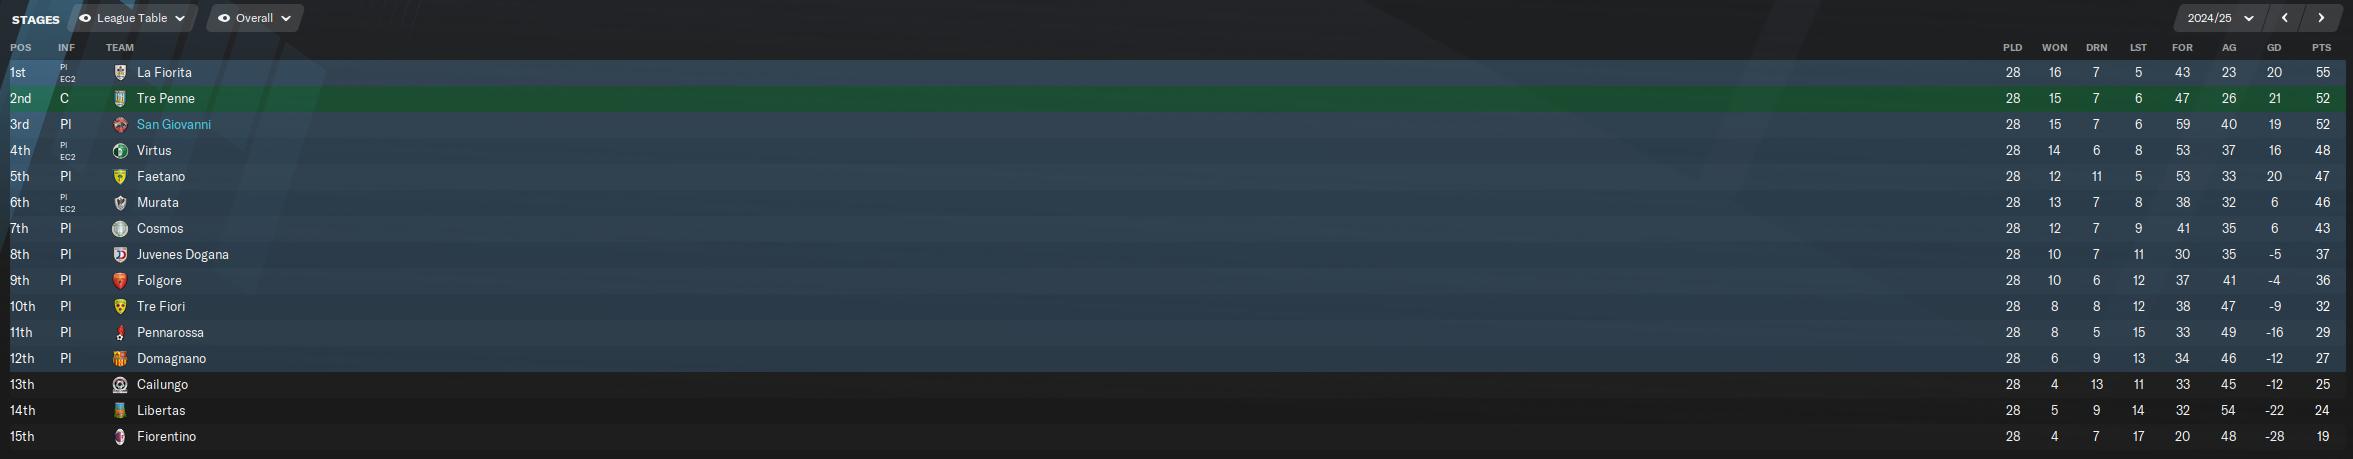 24-25 league table.PNG